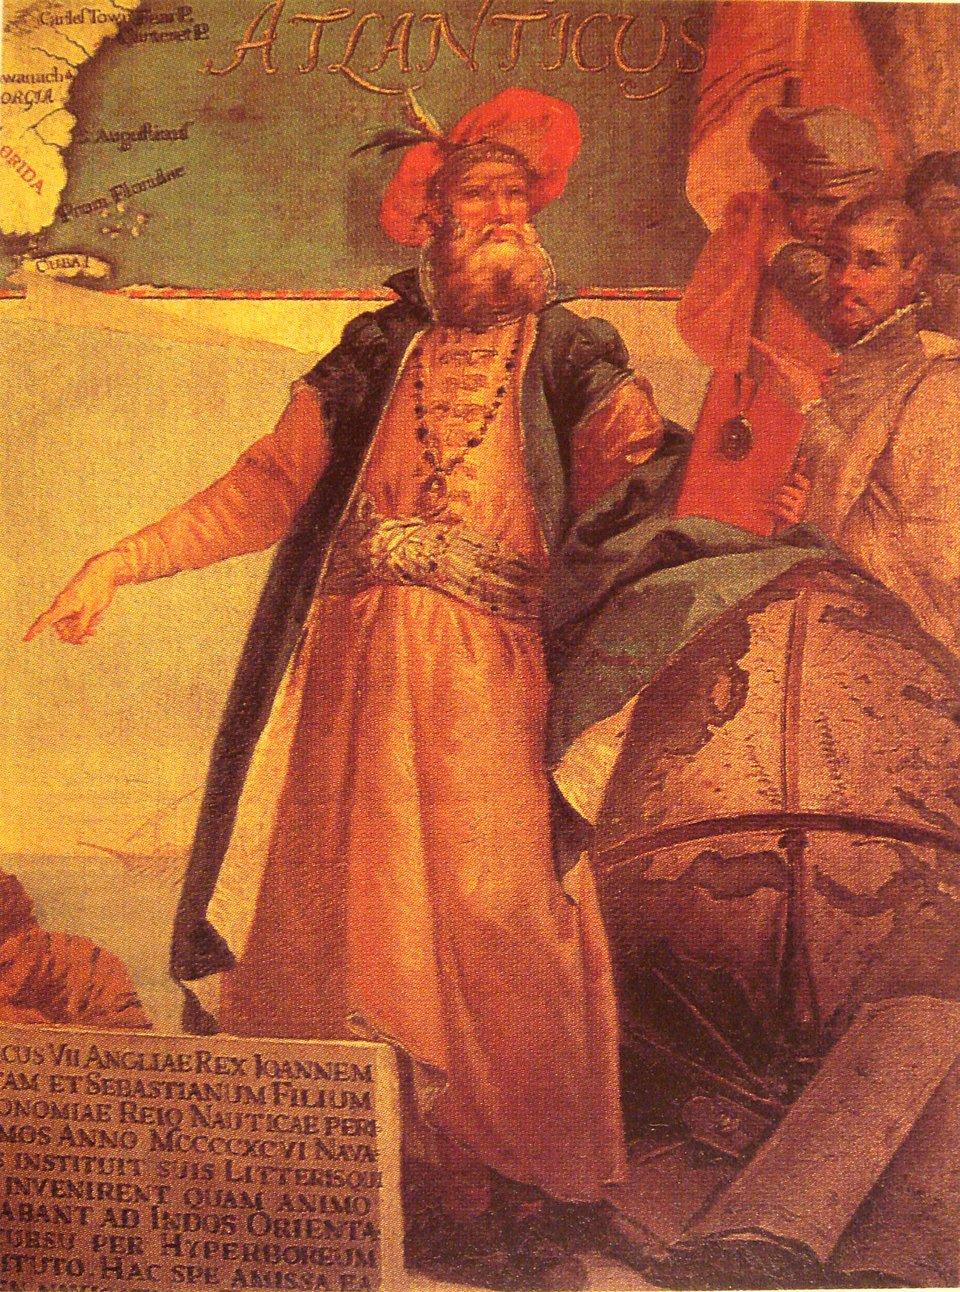 John Cabot Źródło: Giustino Menescardi, John Cabot, 1762, domena publiczna.